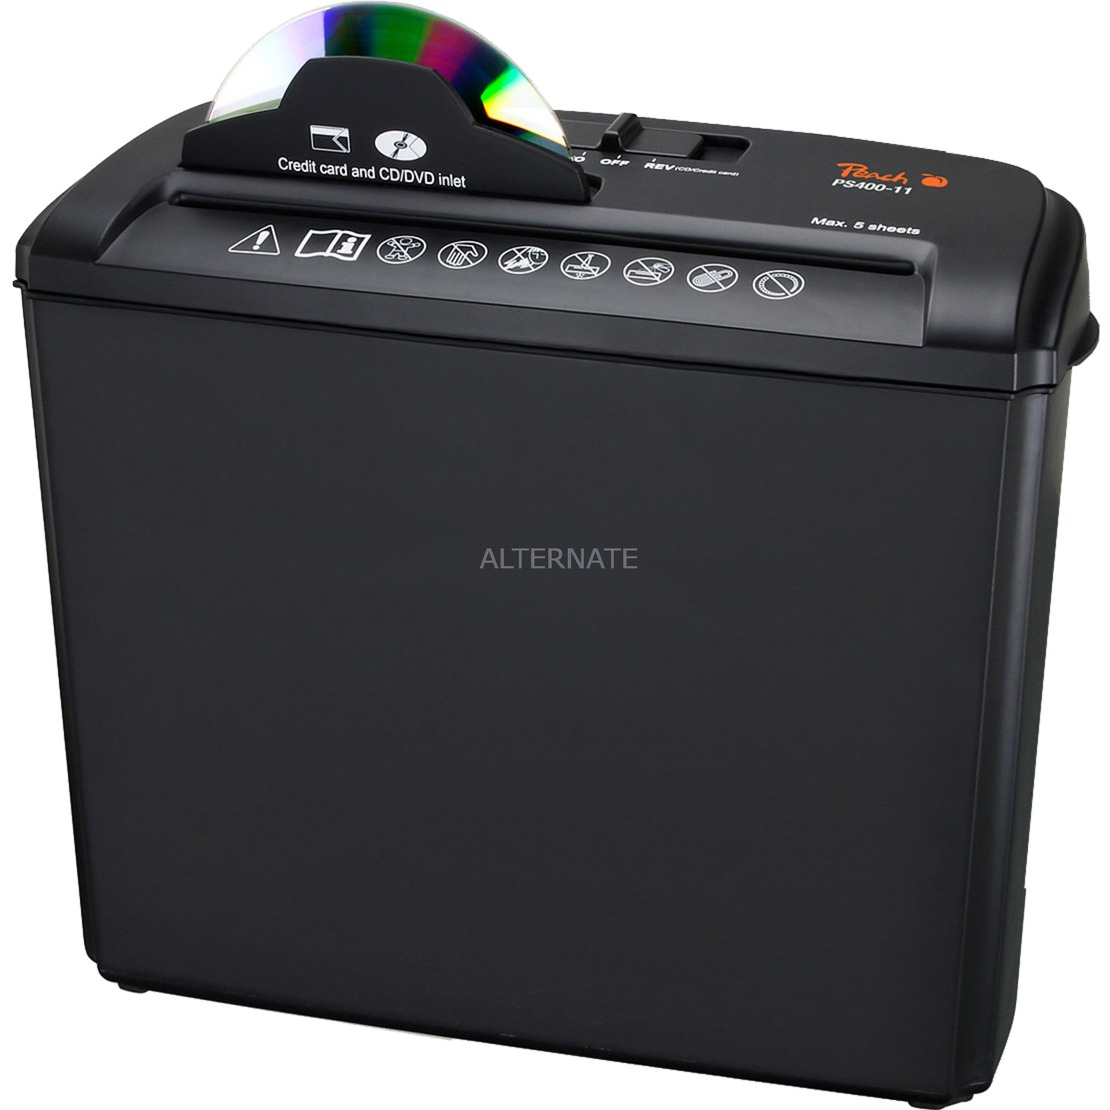 PS400-11 triturador de papel Corte en tiras 72 dB Negro, Plata, Destructora de documentos